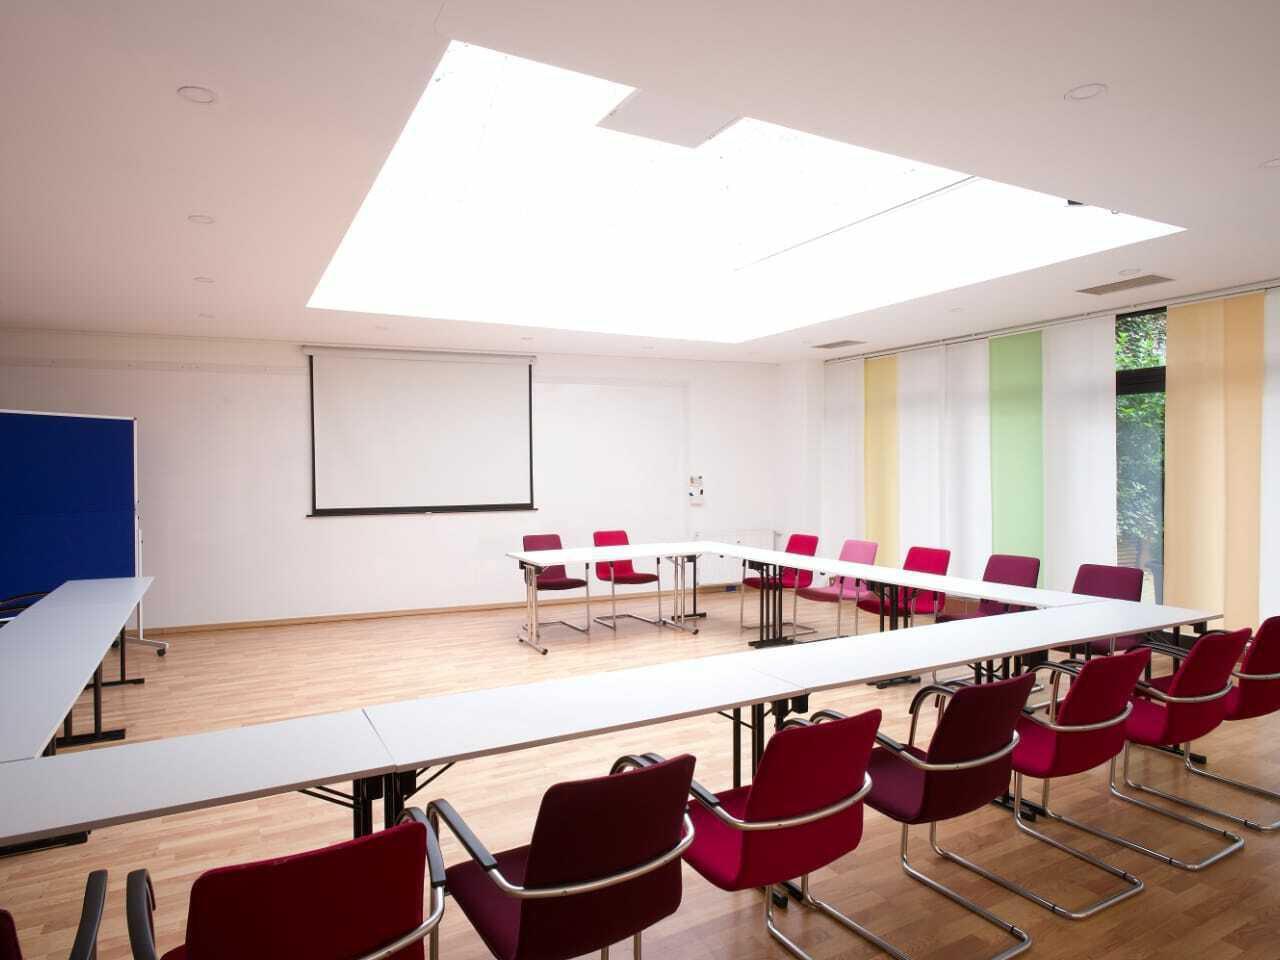 Berlin  Eventraum Pavillon image 0